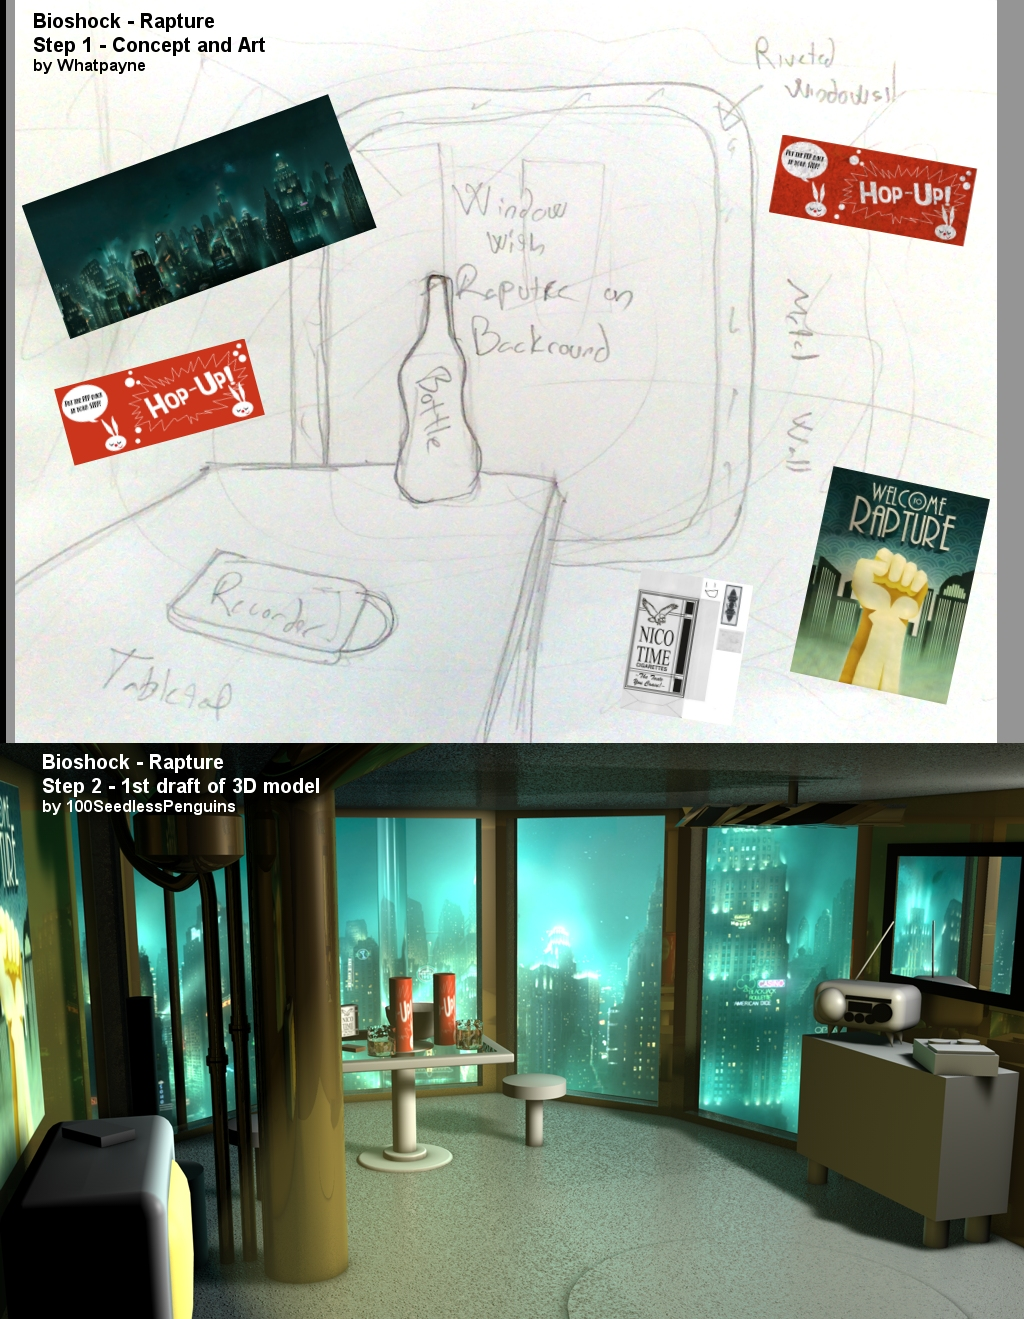 Bioshock - Rapture - Steps 1-2